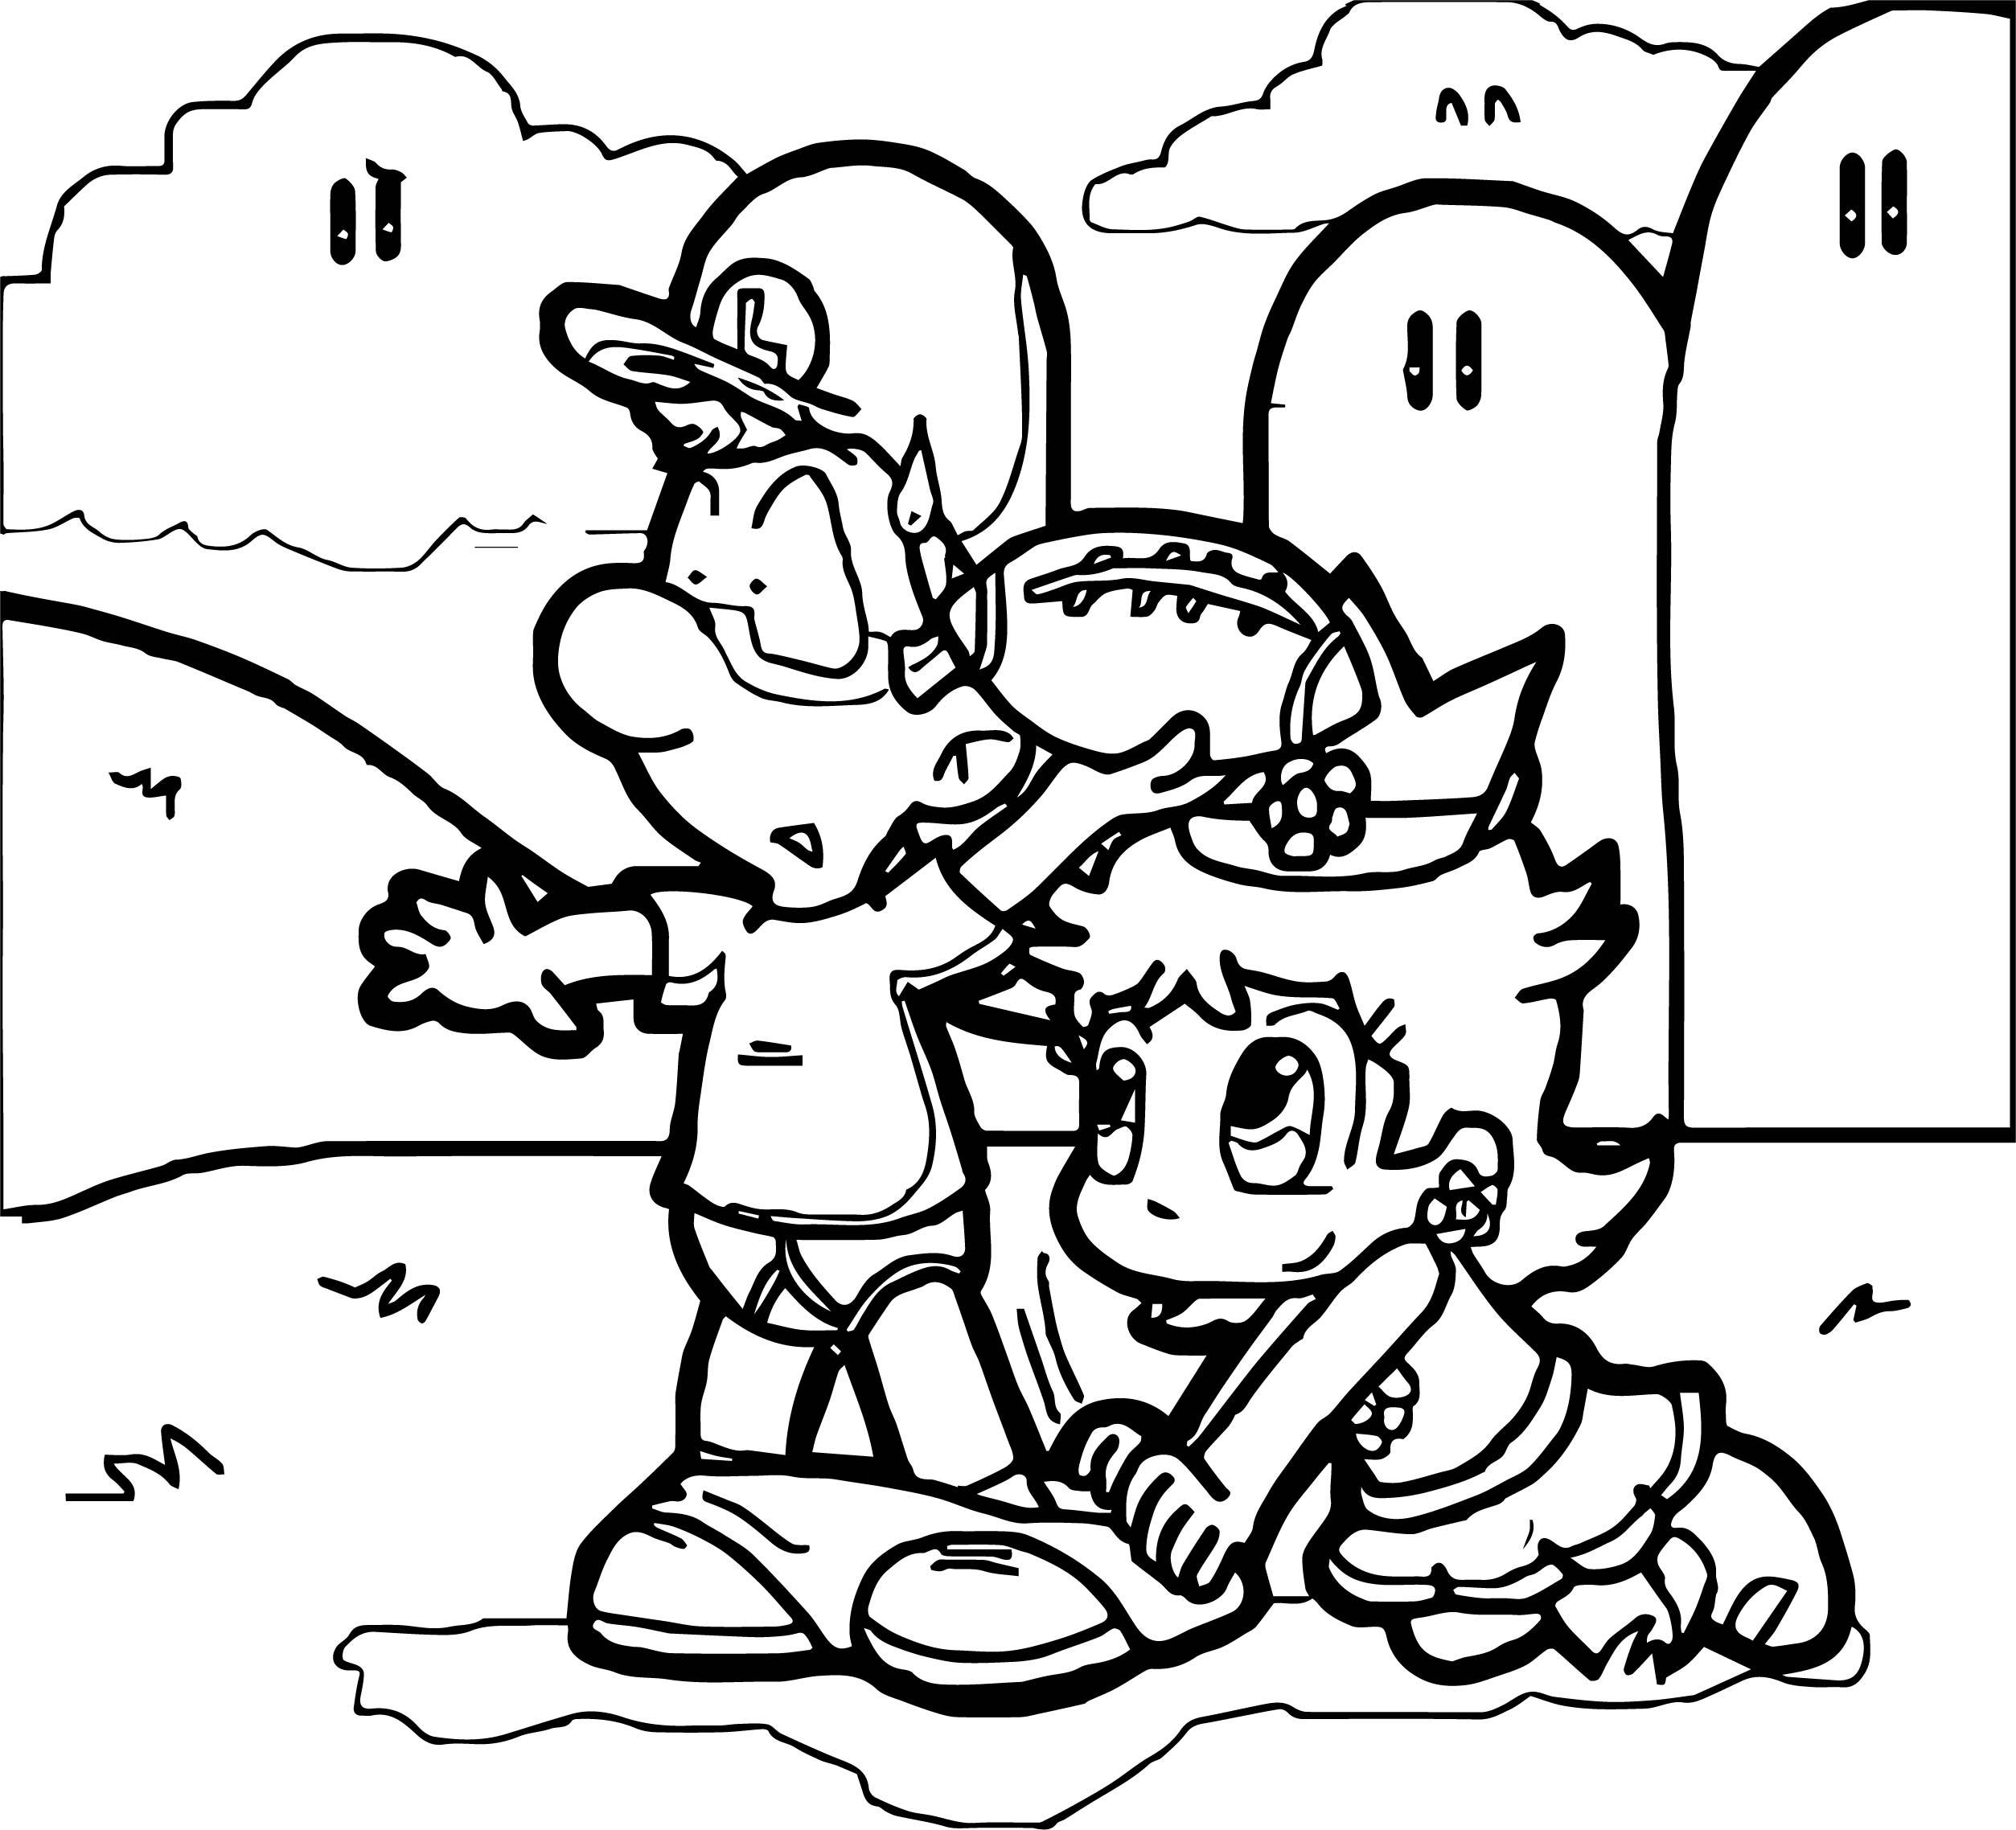 Luigi Daisy Joke Coloring Page